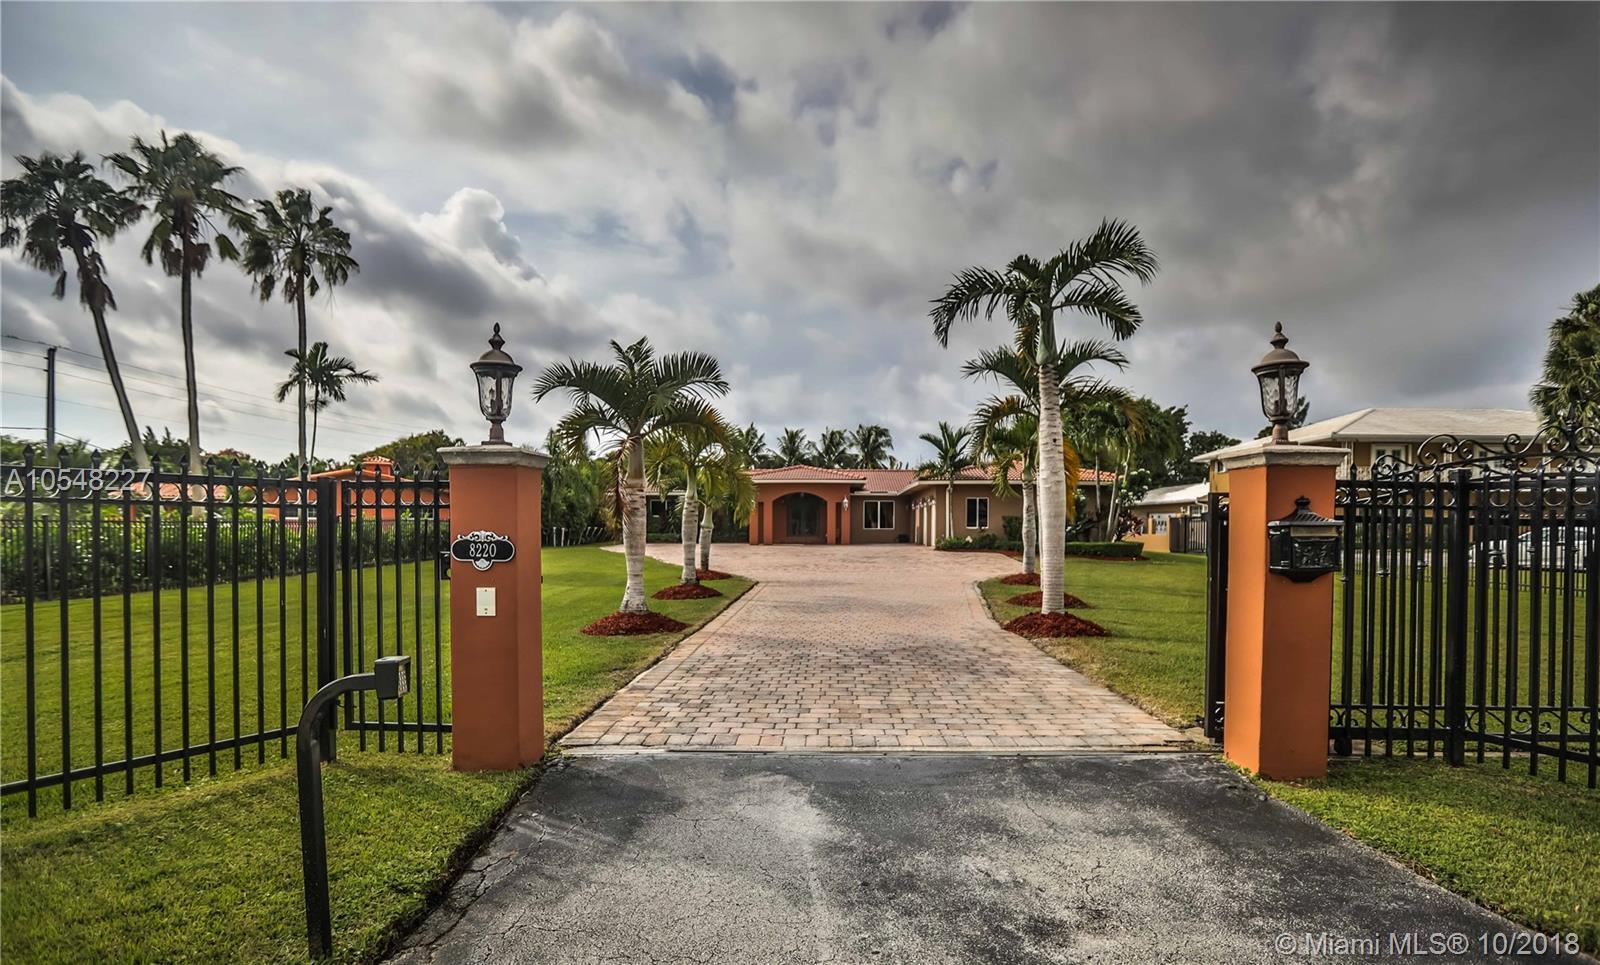 8220 Miller Dr, Miami, FL 33155